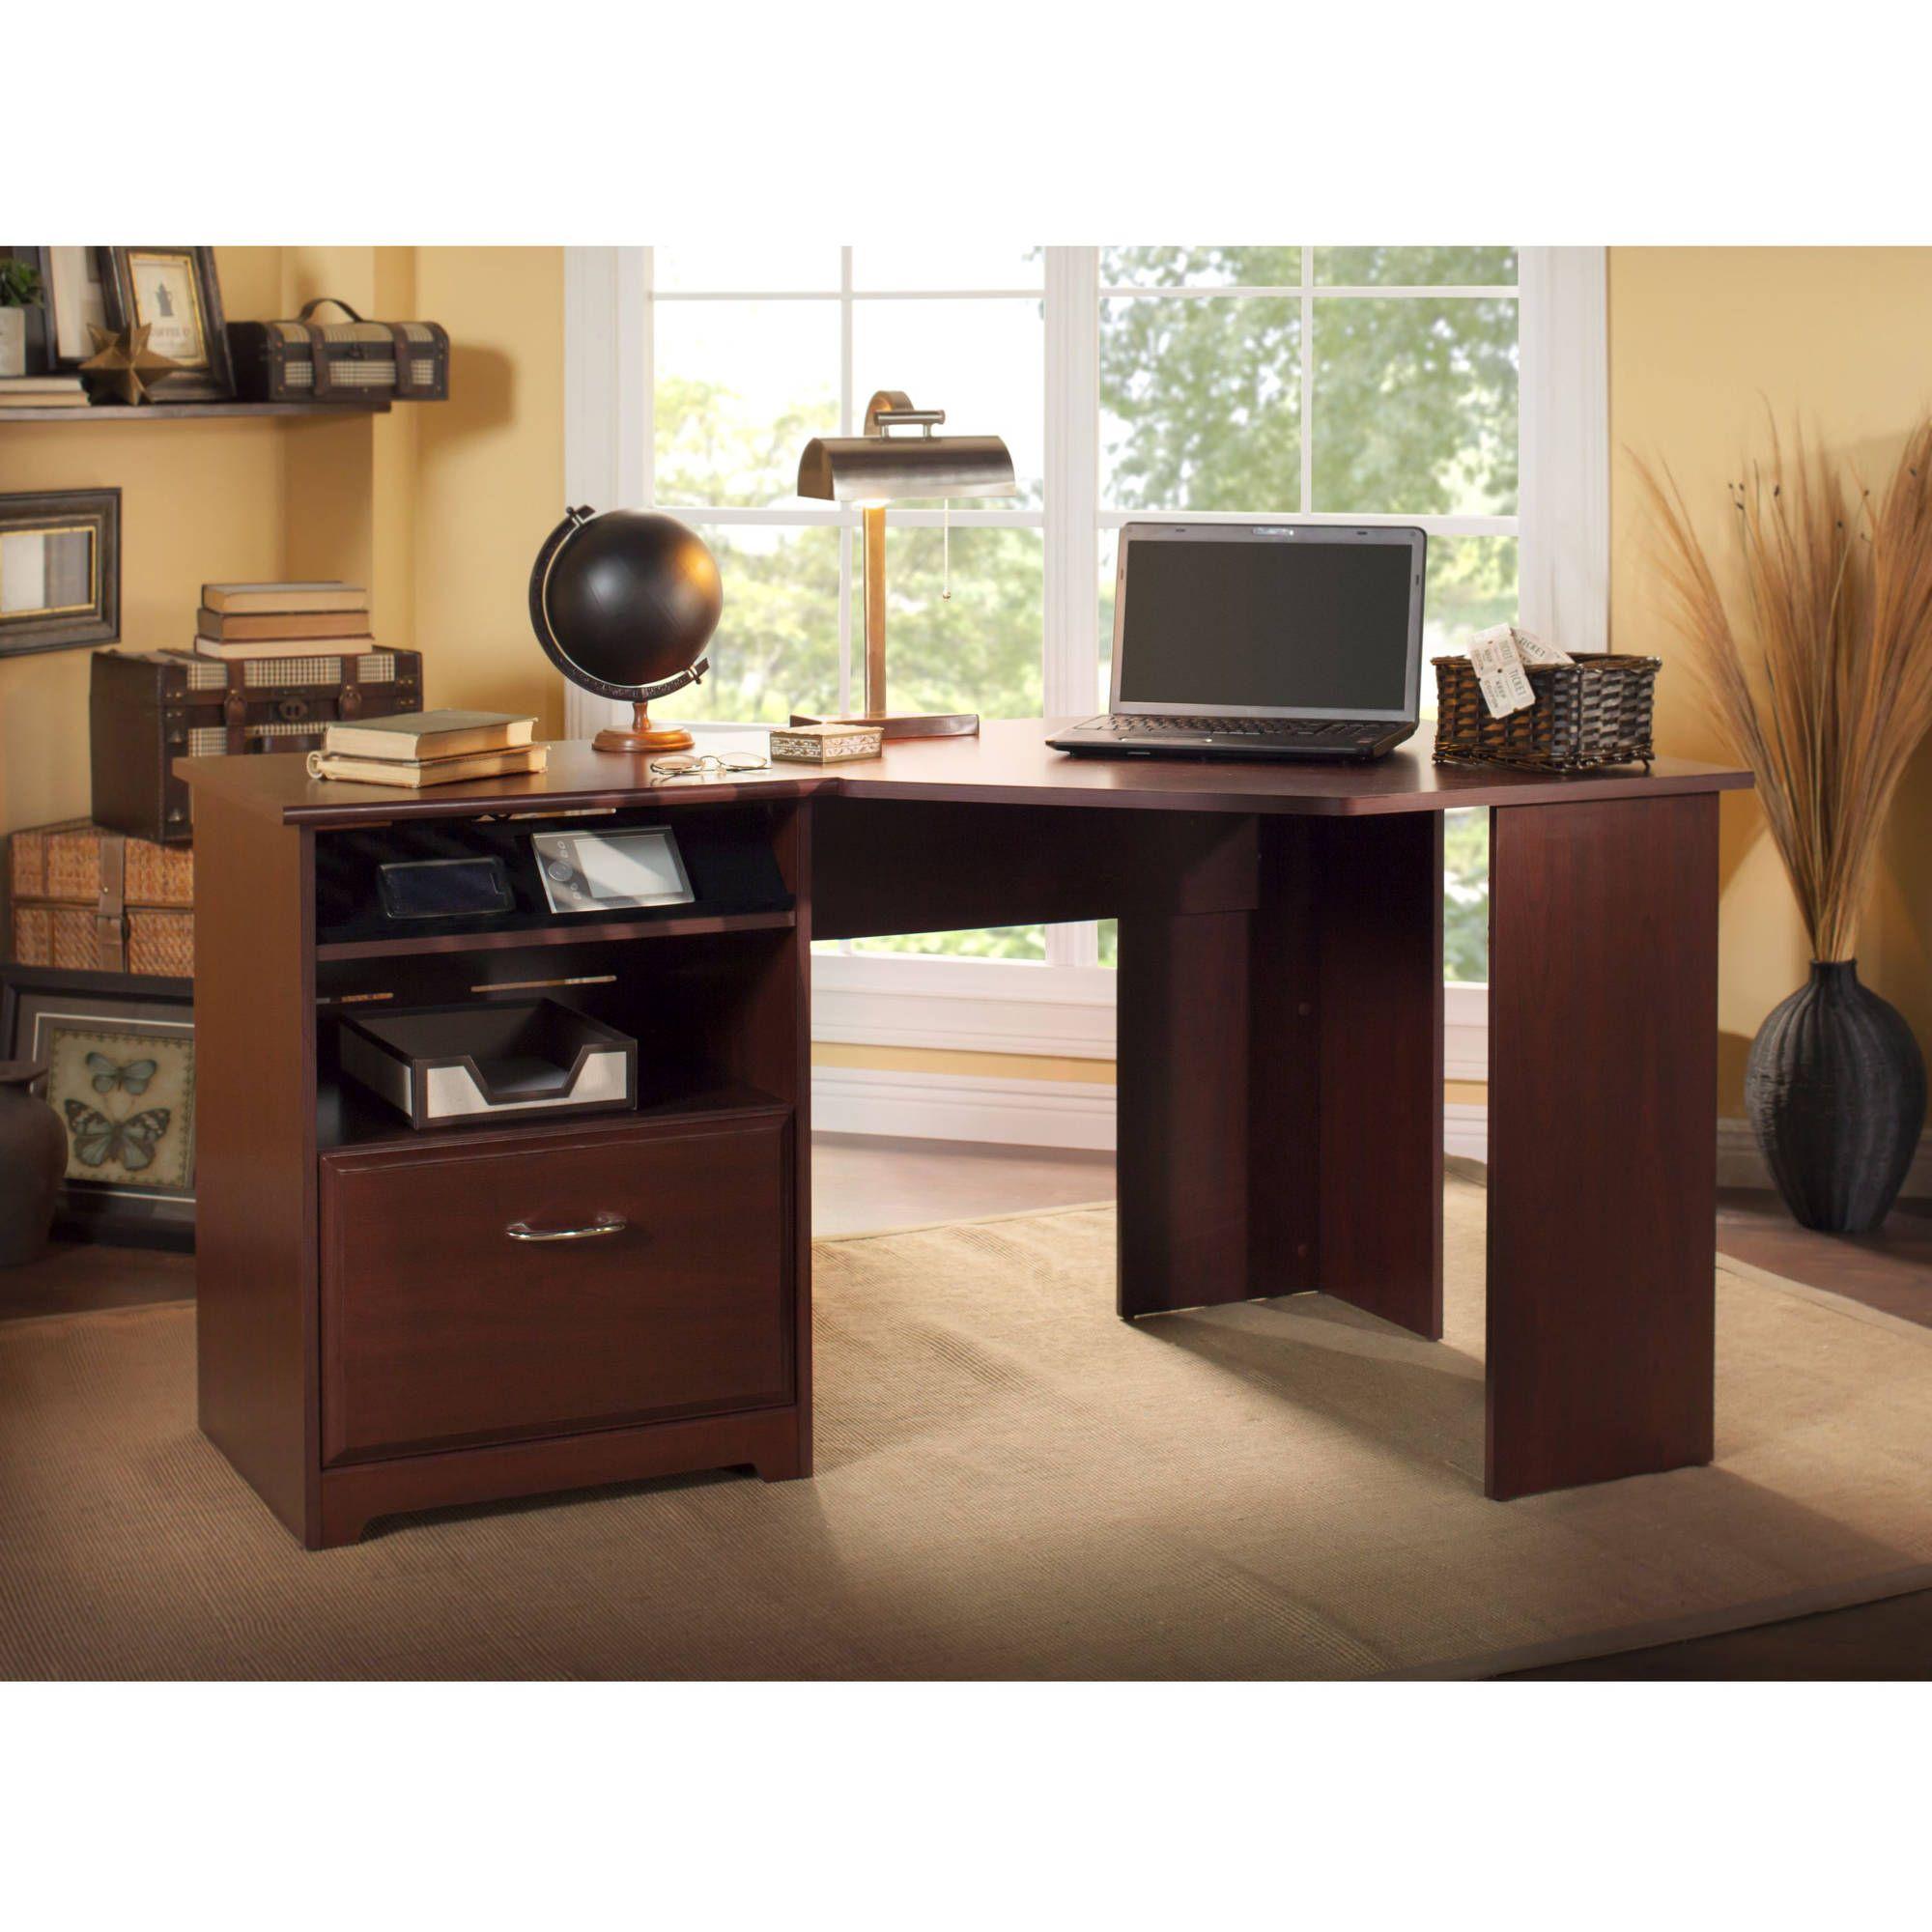 Perfect Bush Furniture Corner Desk   Modern Luxury Furniture Check More At  Http://searchfororangecountyhomes